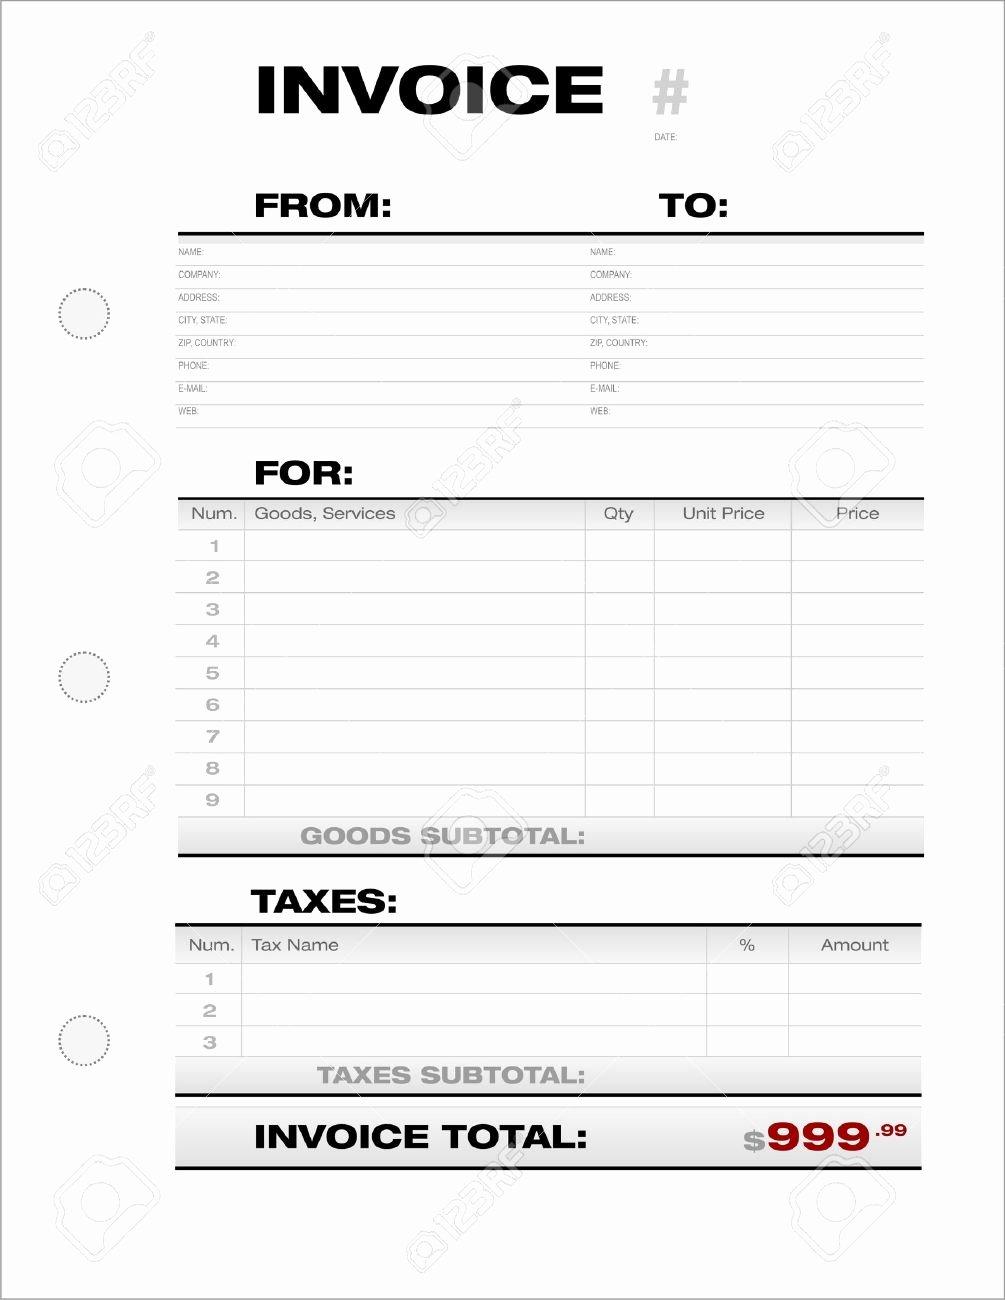 Invoice Document Template